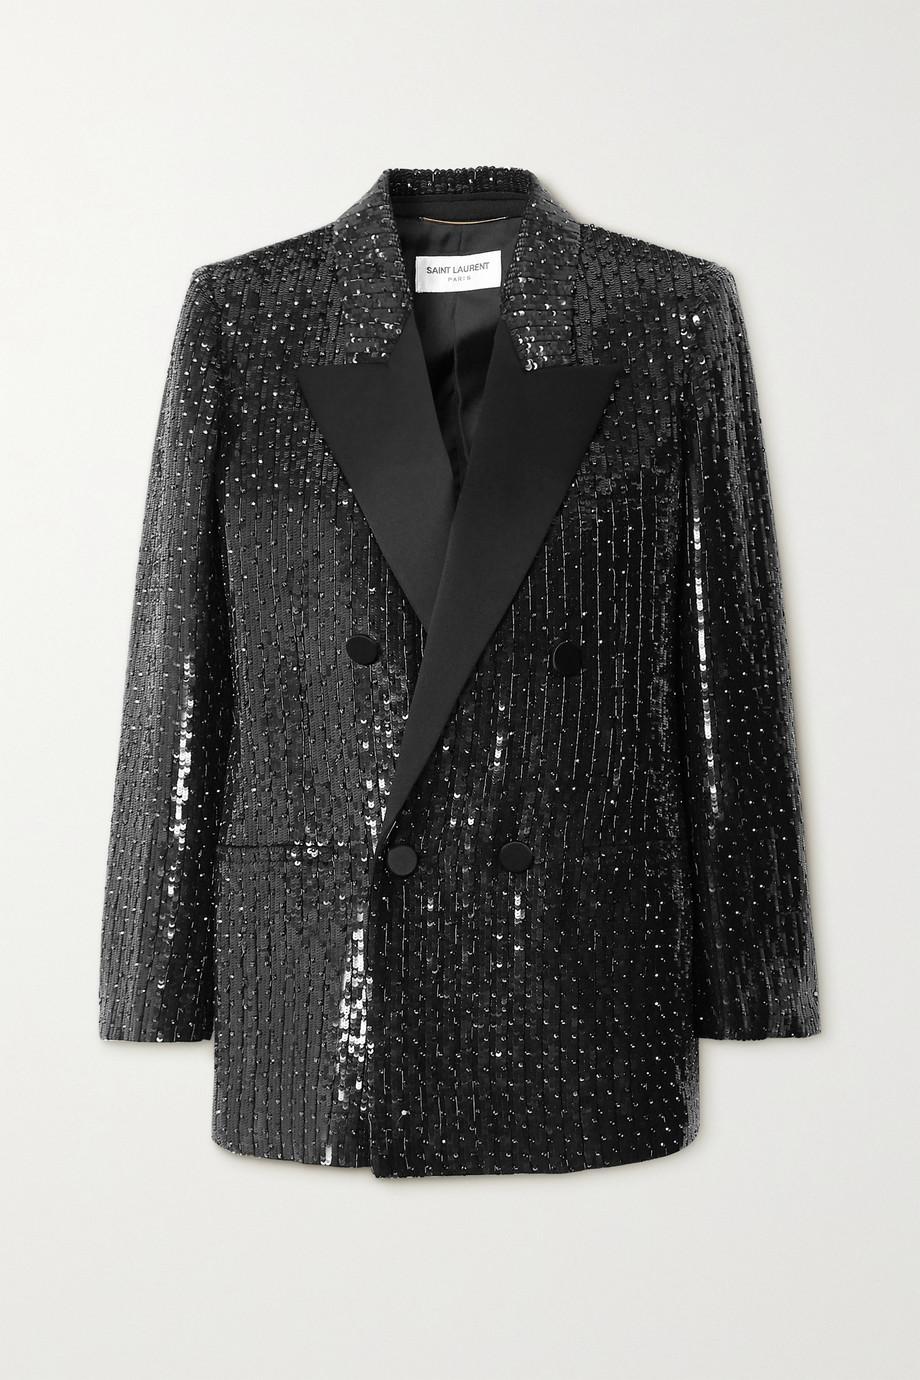 SAINT LAURENT Satin-trimmed sequined crepe blazer